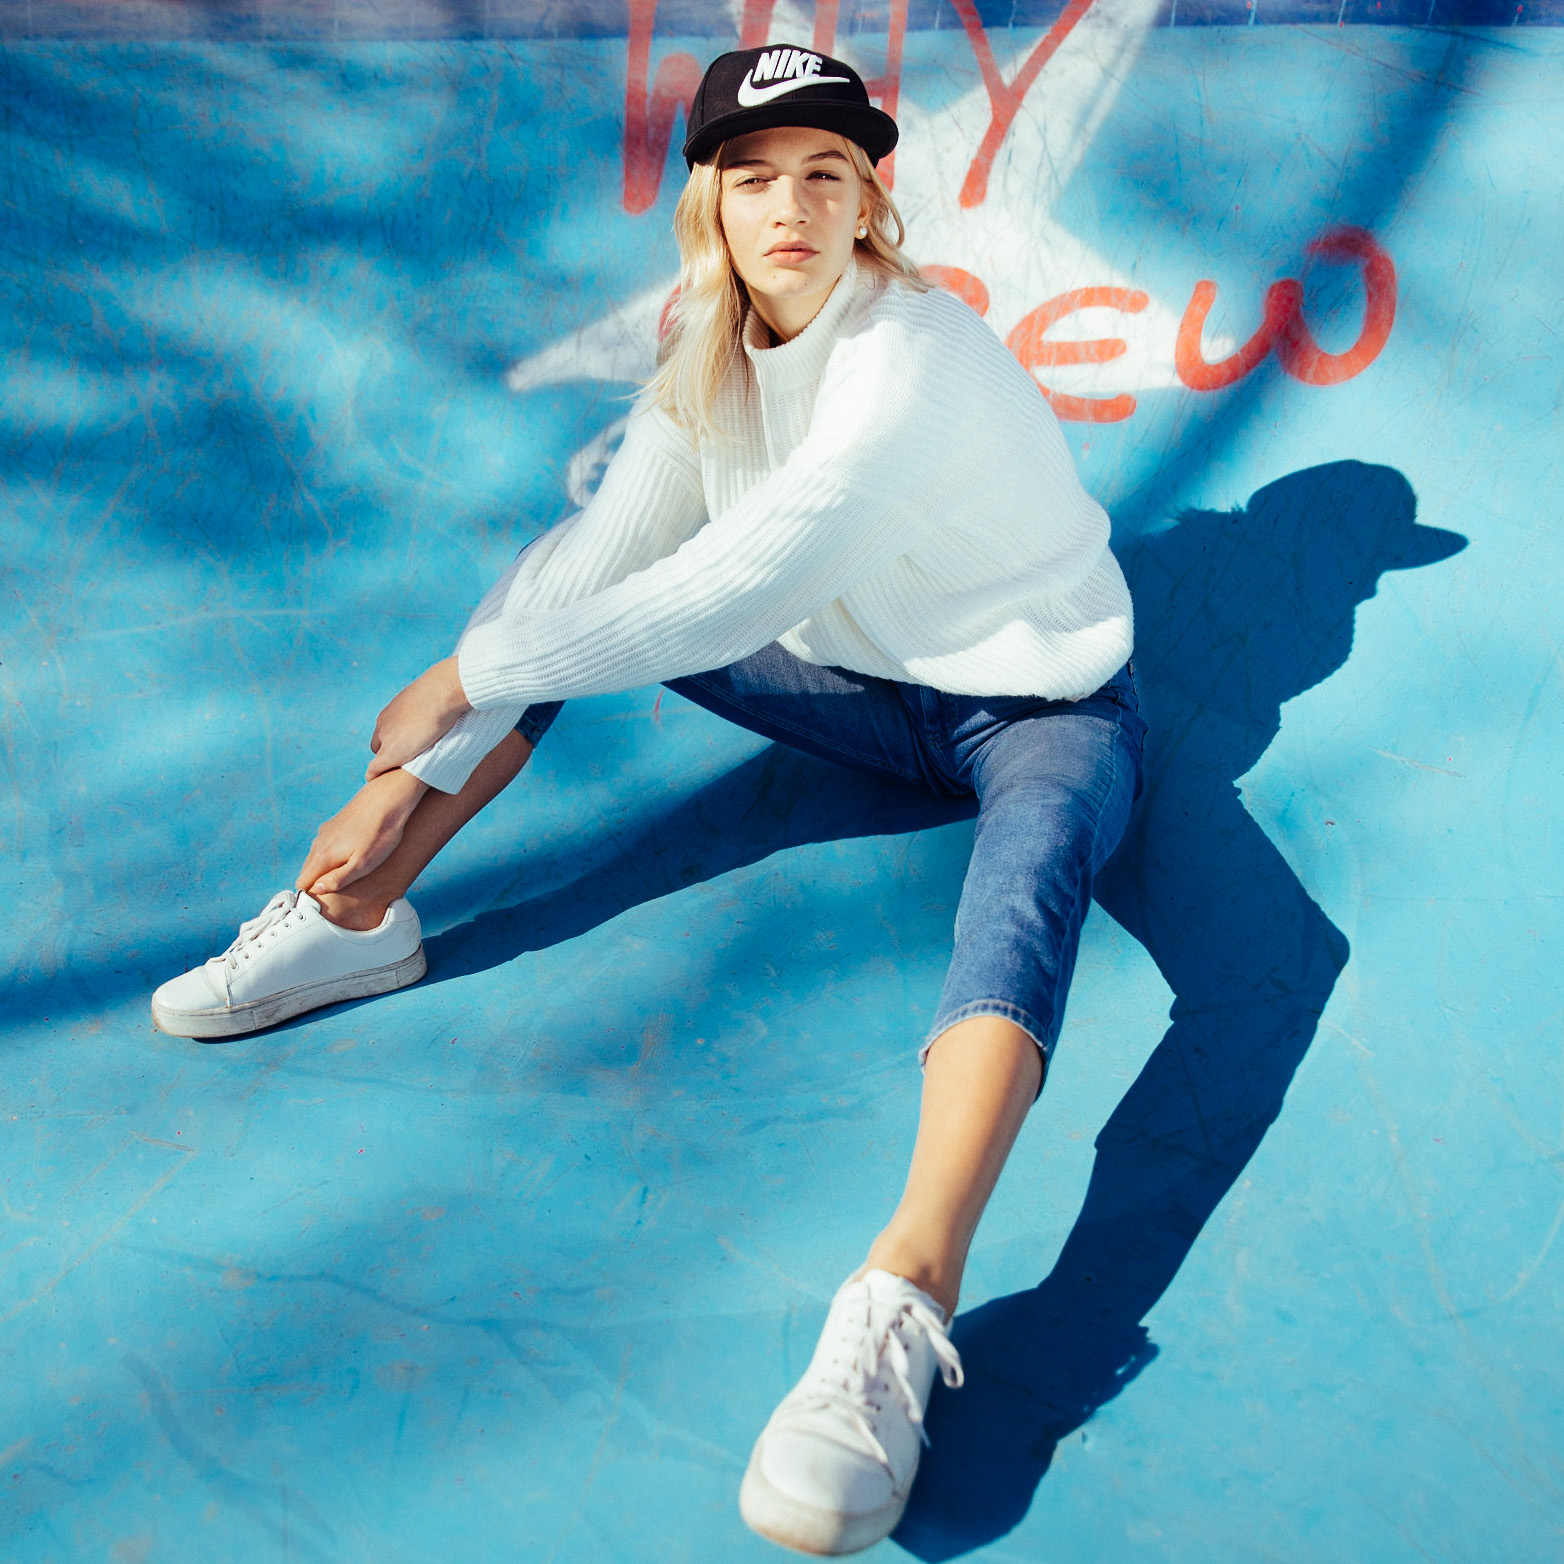 Marlene-Nike-martinphox-portfolio-web-3